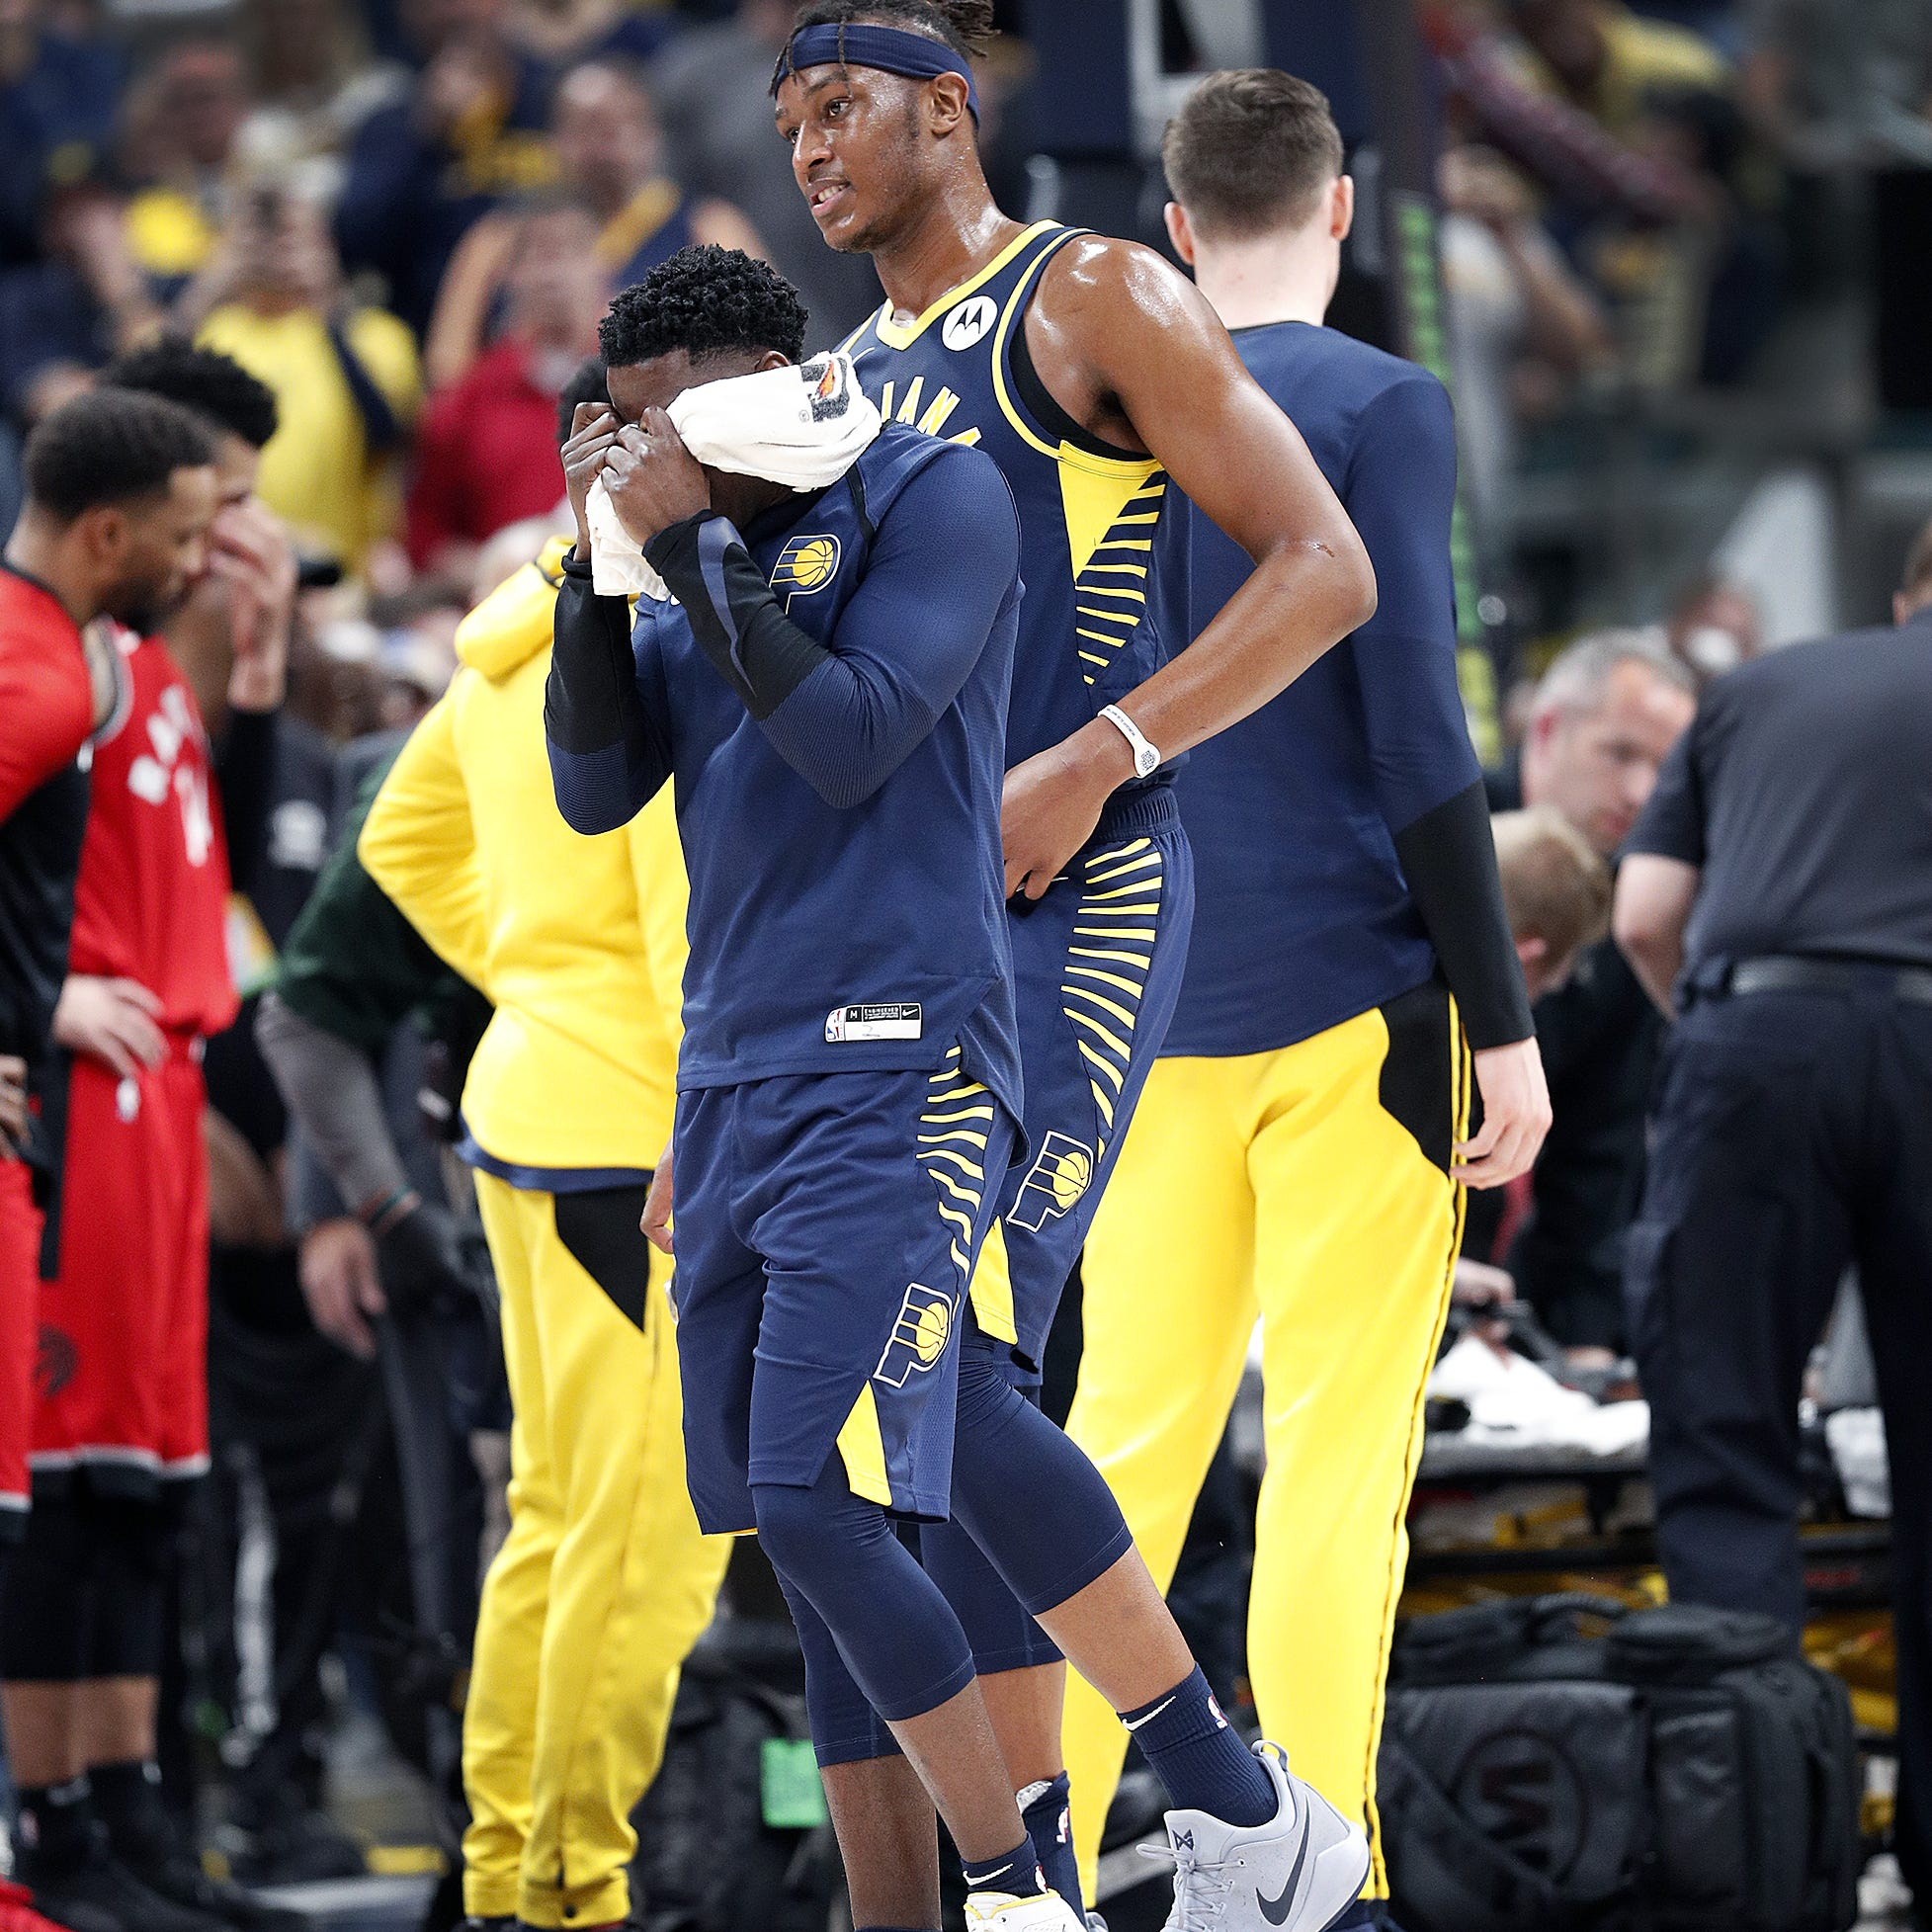 Victor Oladipo's 'serious' knee injury overshadows Pacers' win over Raptors